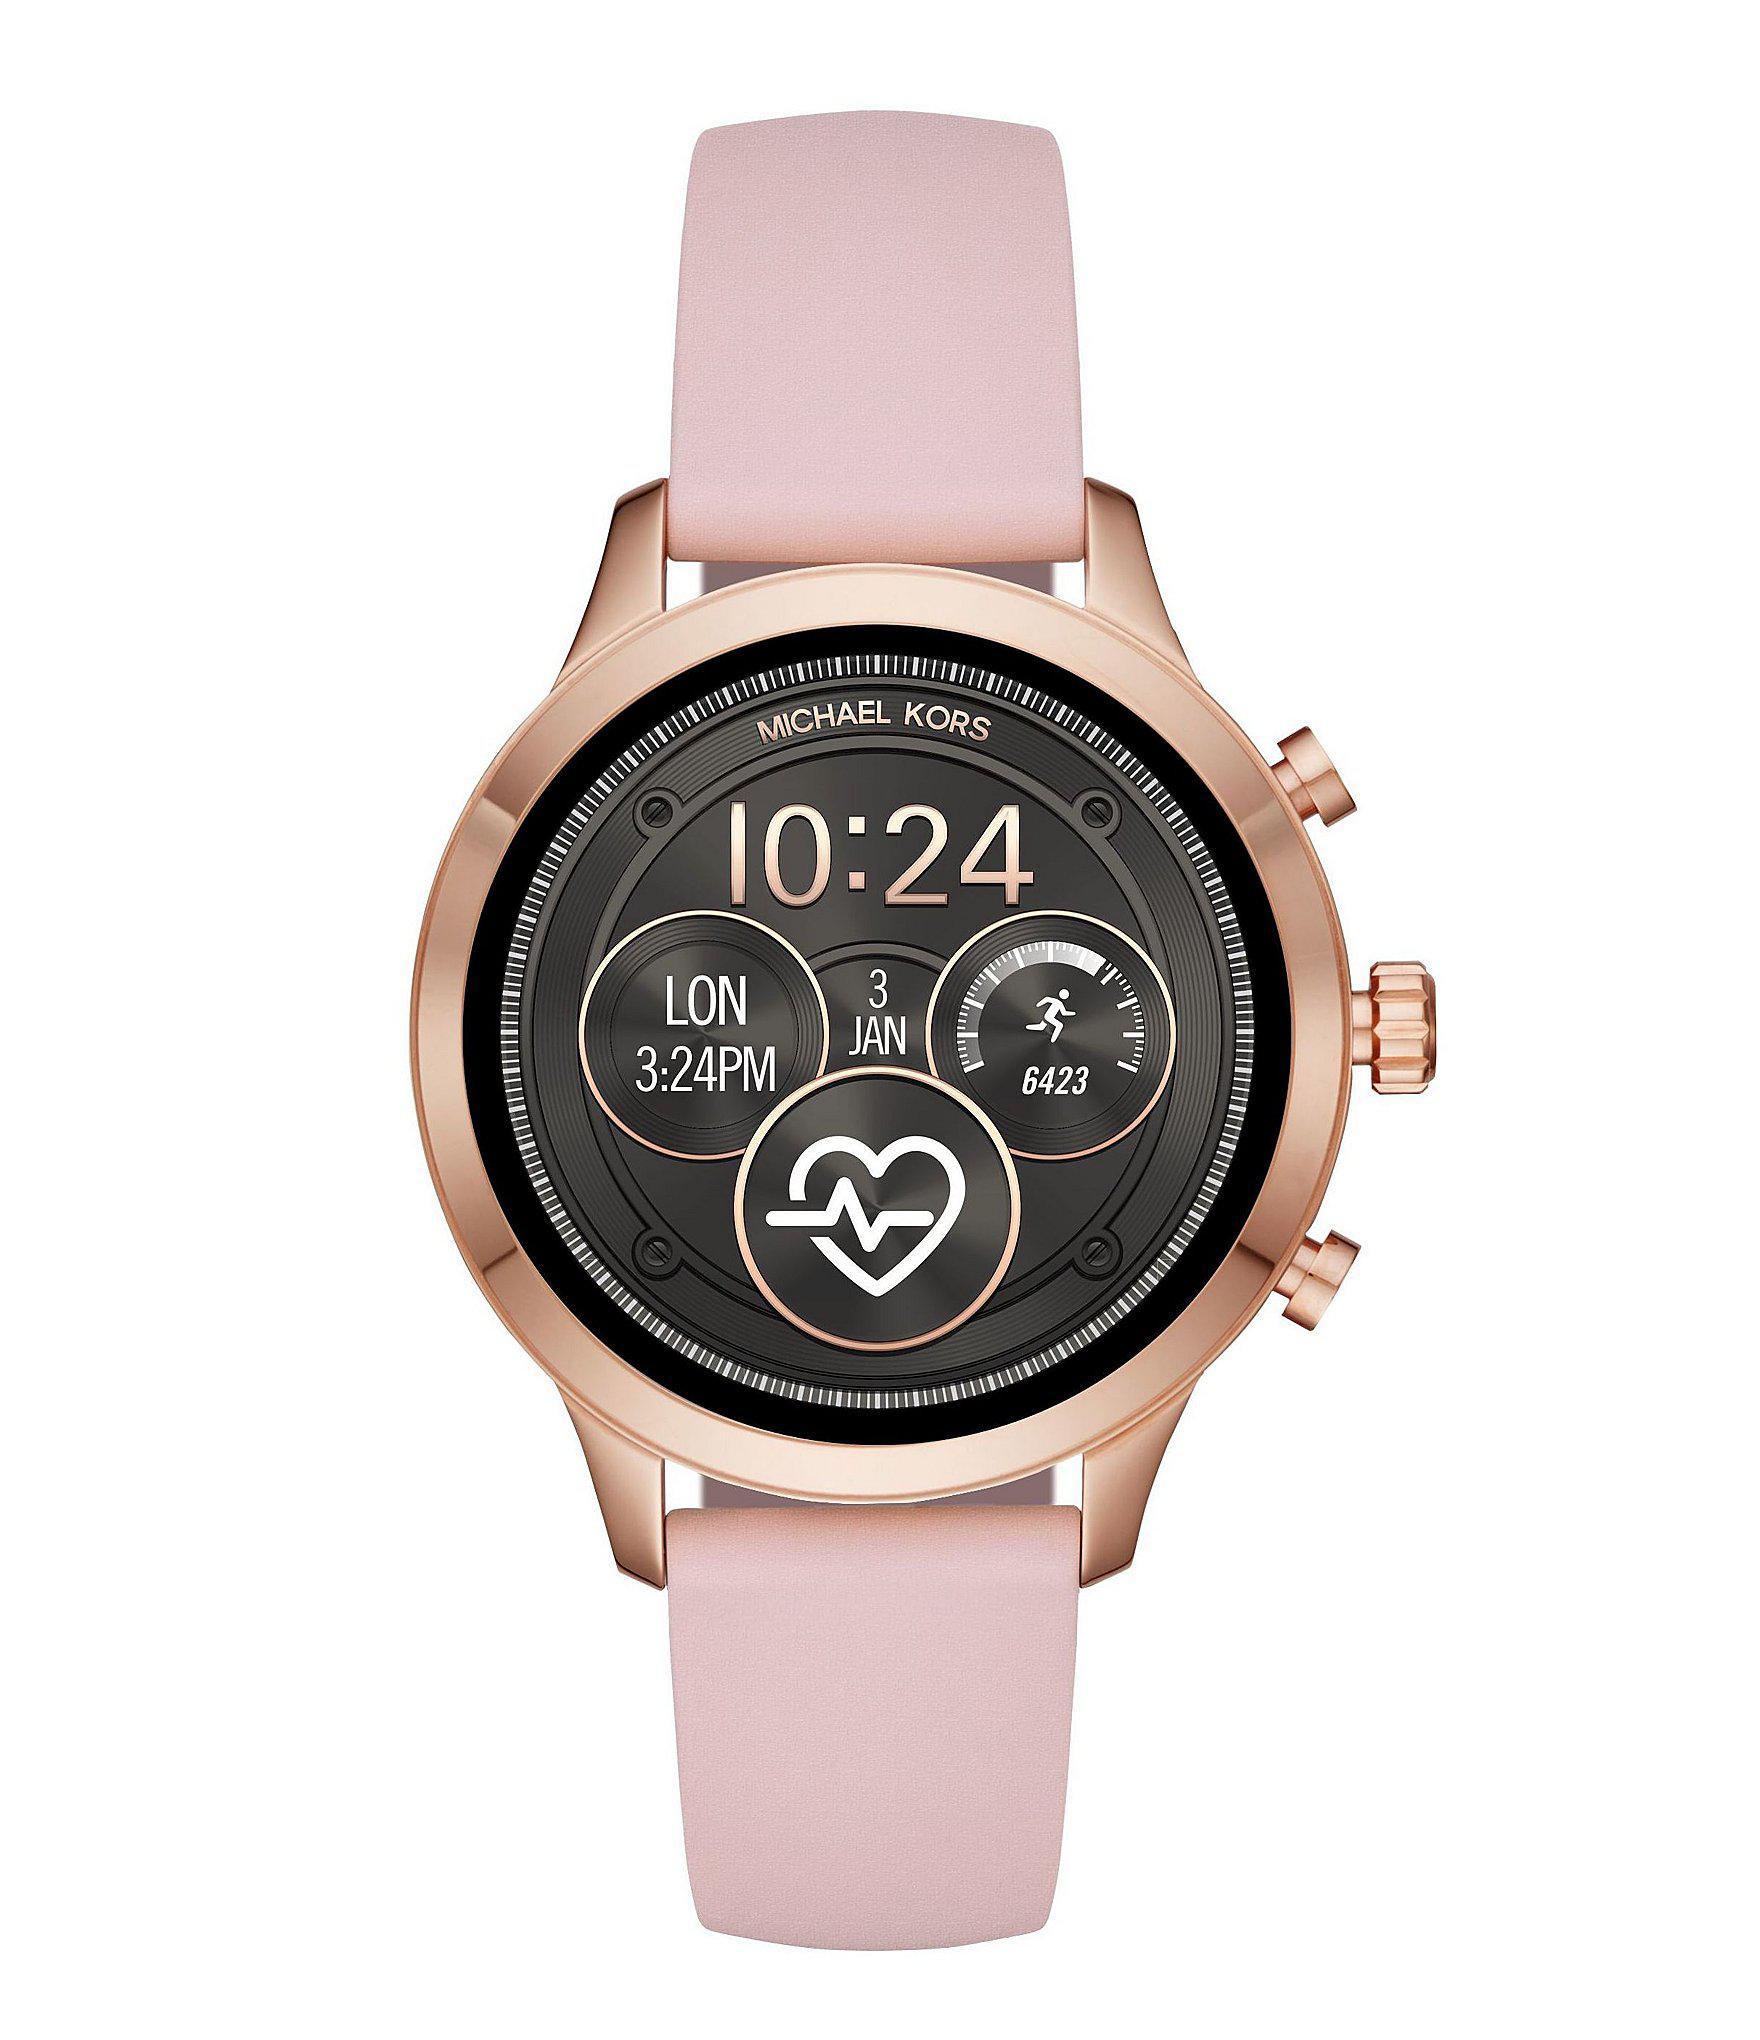 297376b7afed Michael Kors - Runway Pink Smartwatch - Lyst. View fullscreen